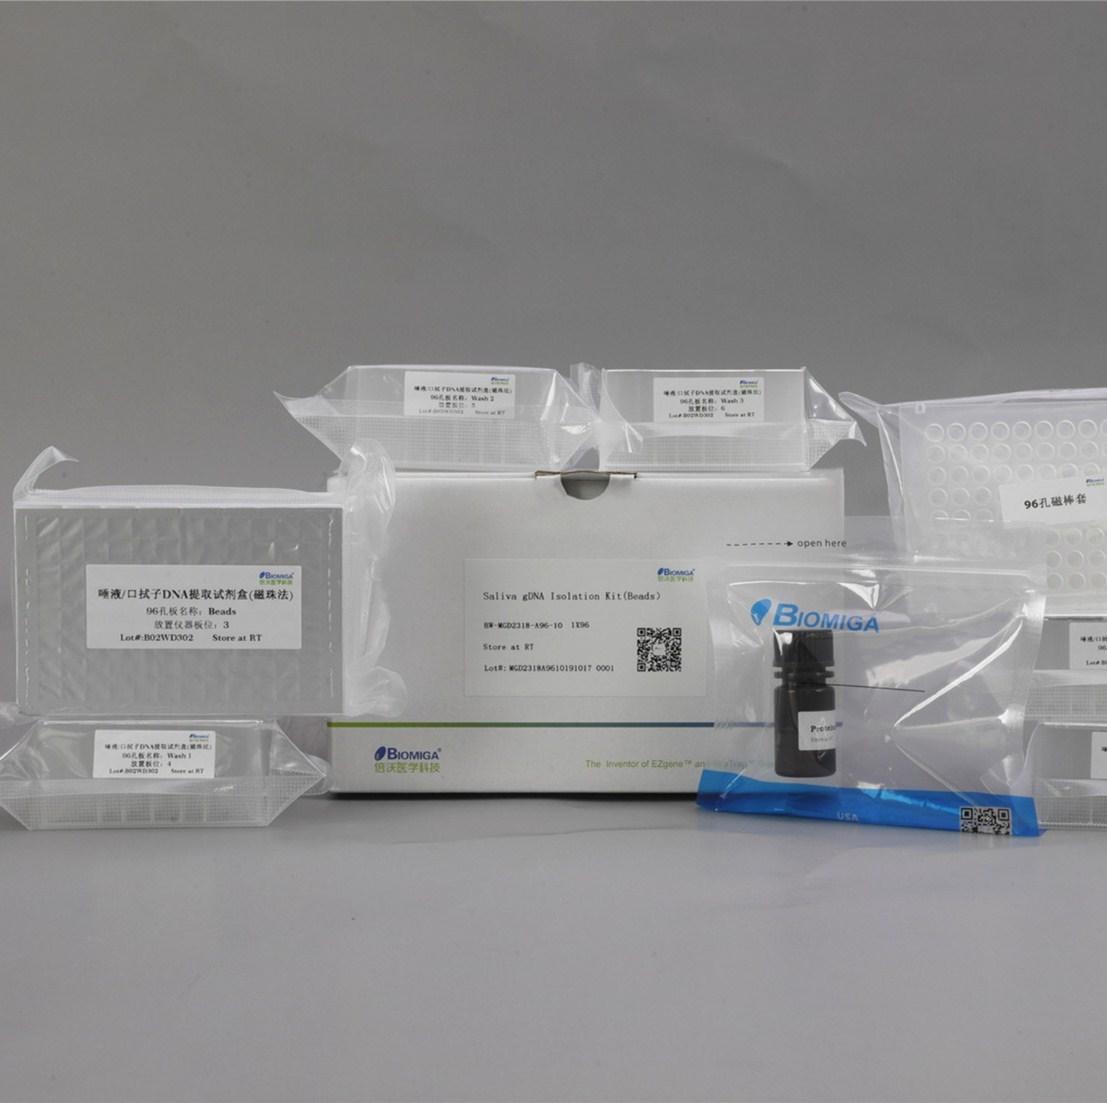 Saliva gDNA Isolation Kit (Beads) 唾液基因组DNA提取试剂盒(磁珠法)医疗器械级